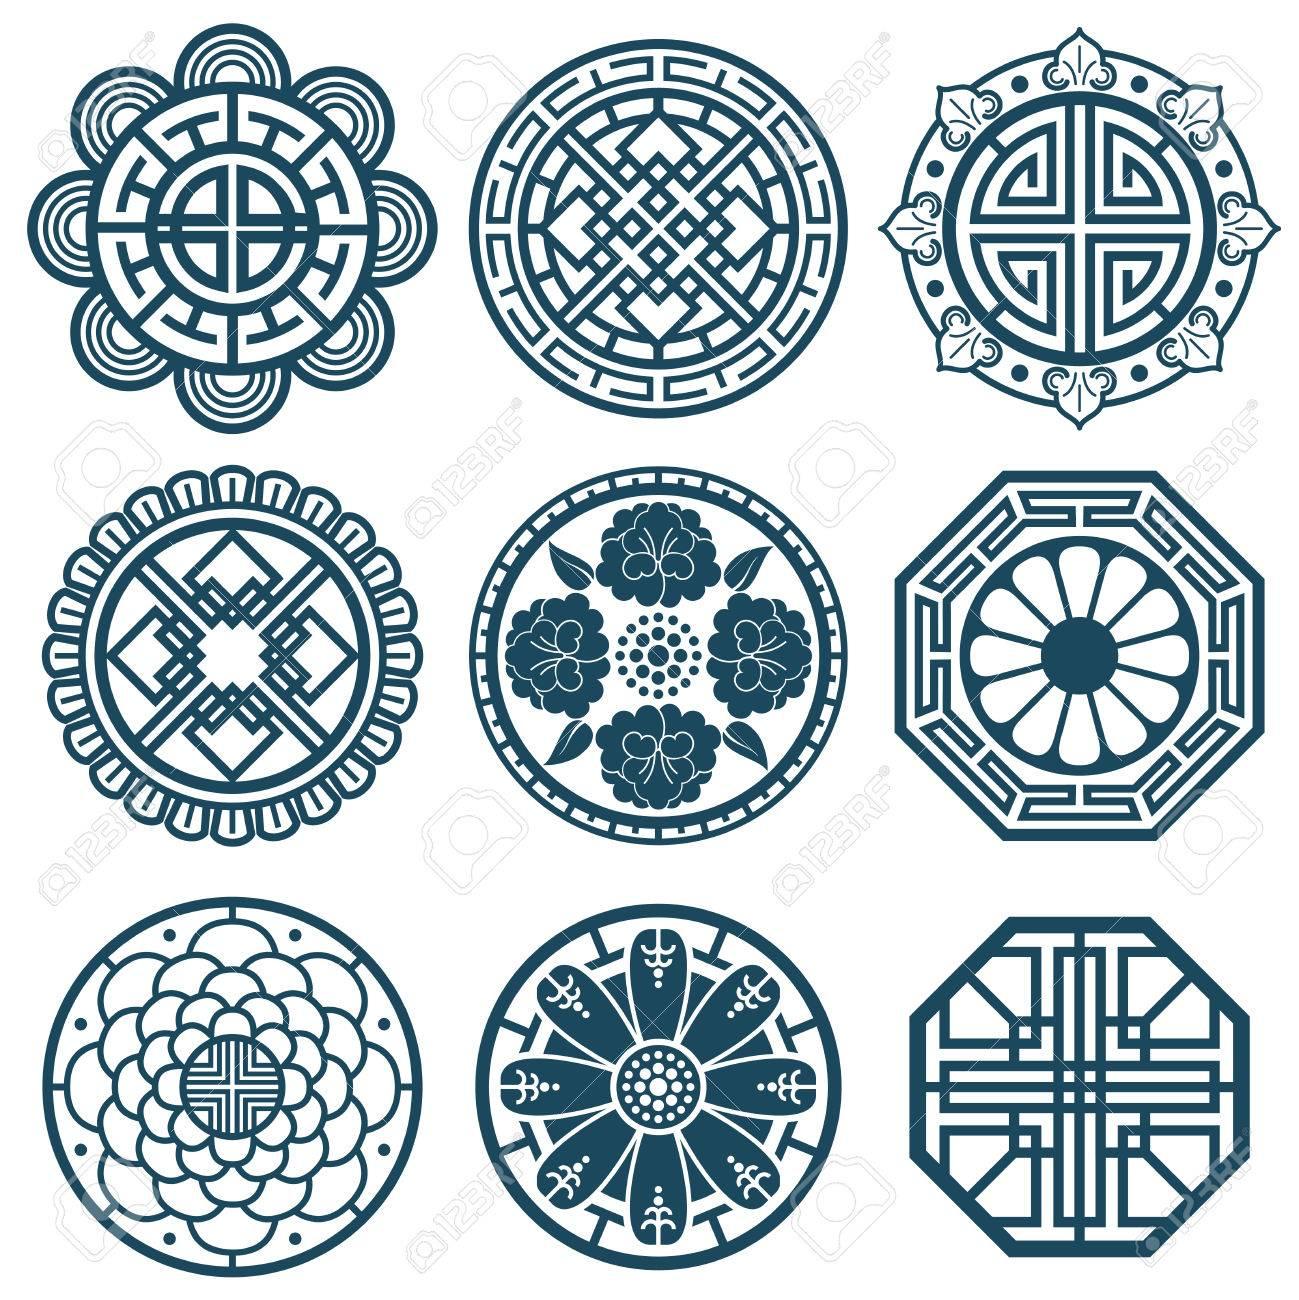 Traditional korean symbols vector korea pattern design for traditional korean symbols vector korea pattern design for bathroom repeat tiles traditional korean pattern biocorpaavc Images